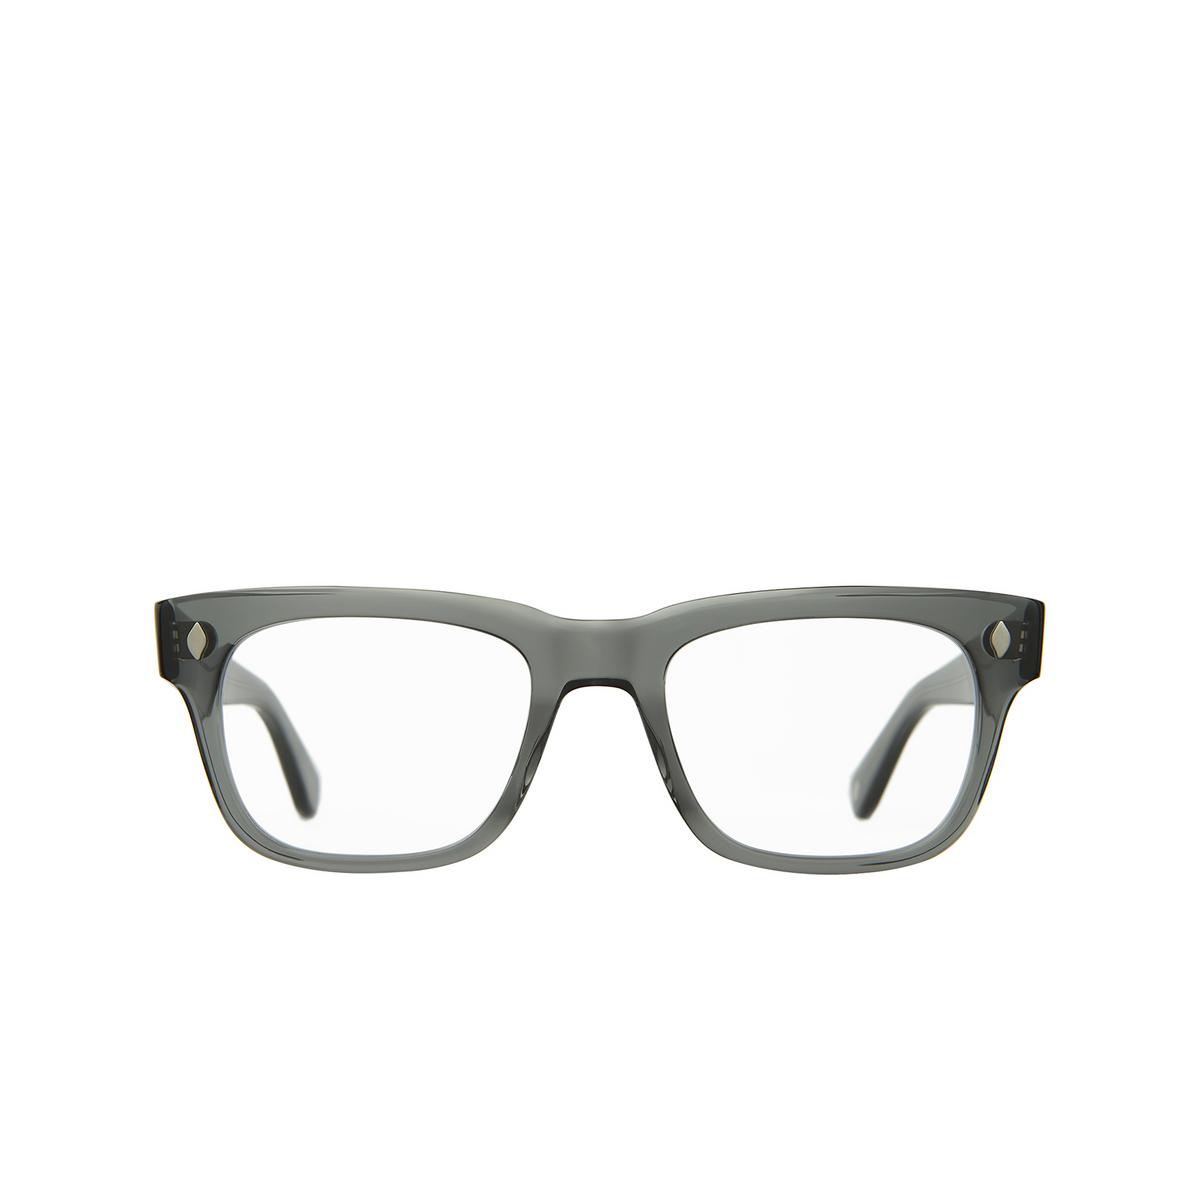 Garrett Leight® Square Eyeglasses: Troubadour color Sea Grey Sgy - front view.